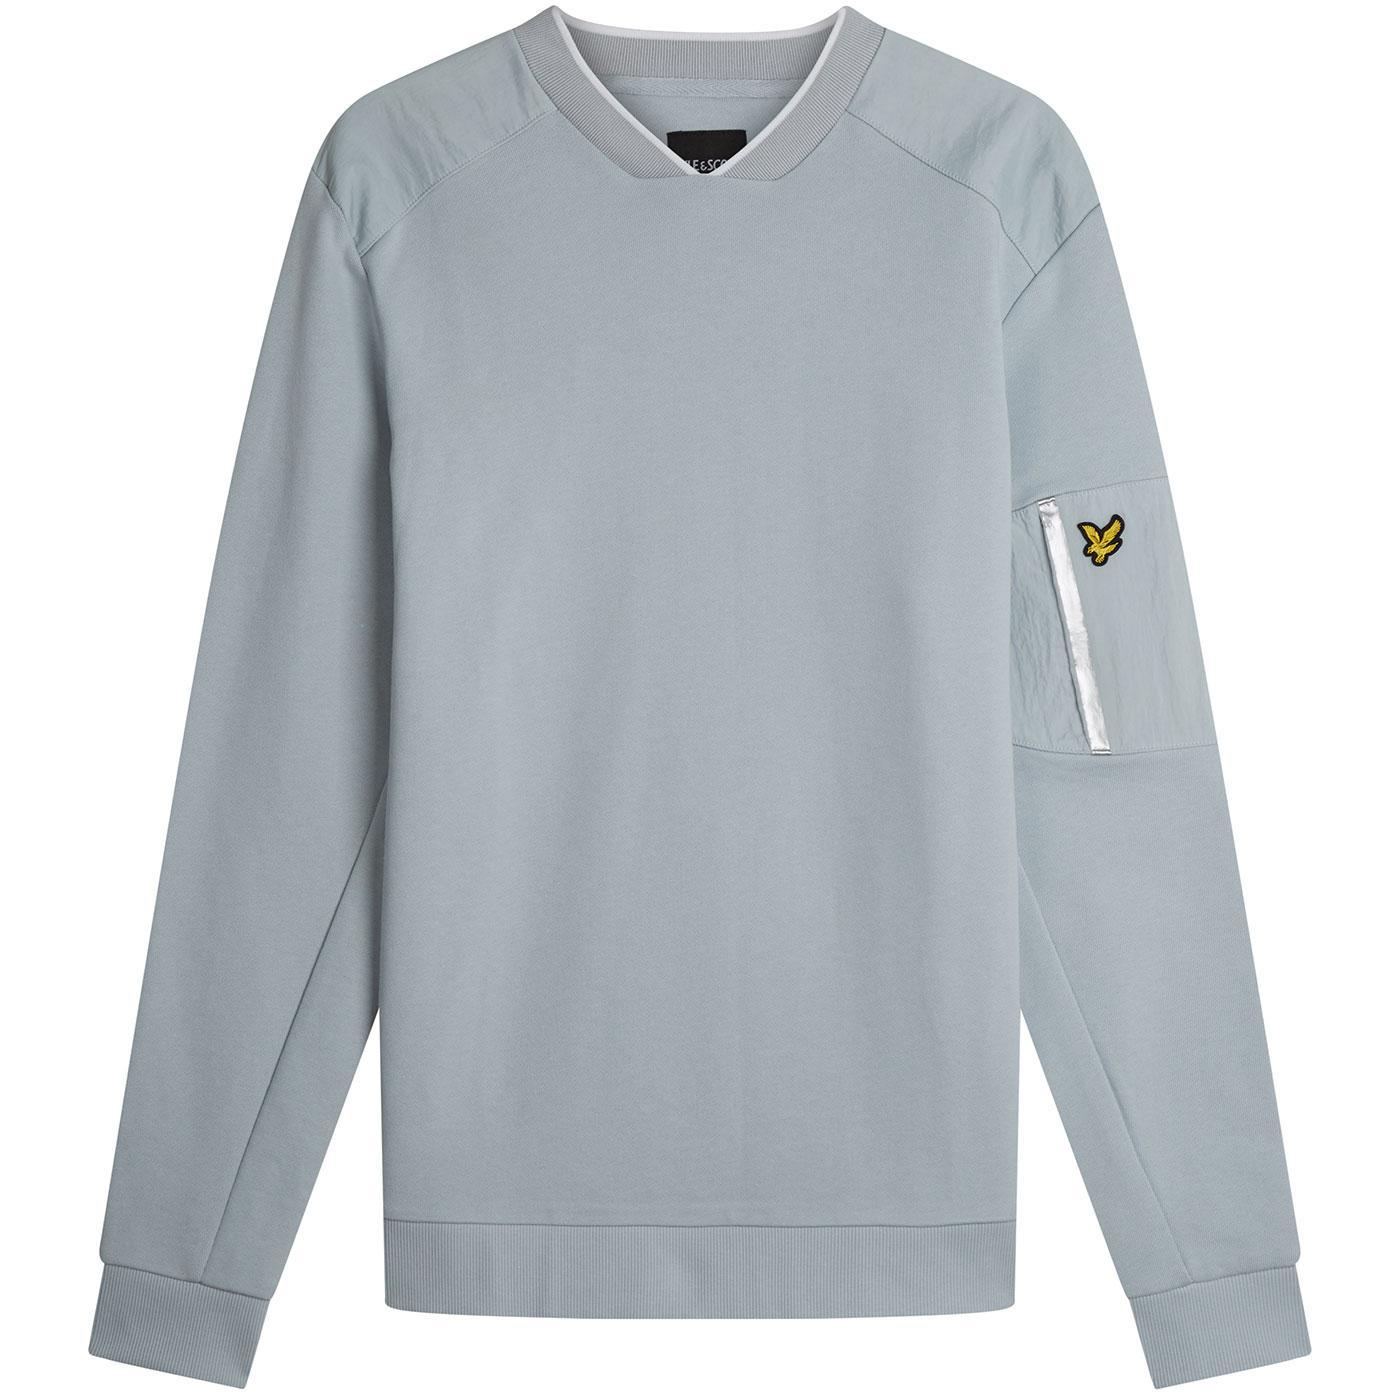 LYLE & SCOTT Nylon Panel Casuals Sweatshirt SILVER